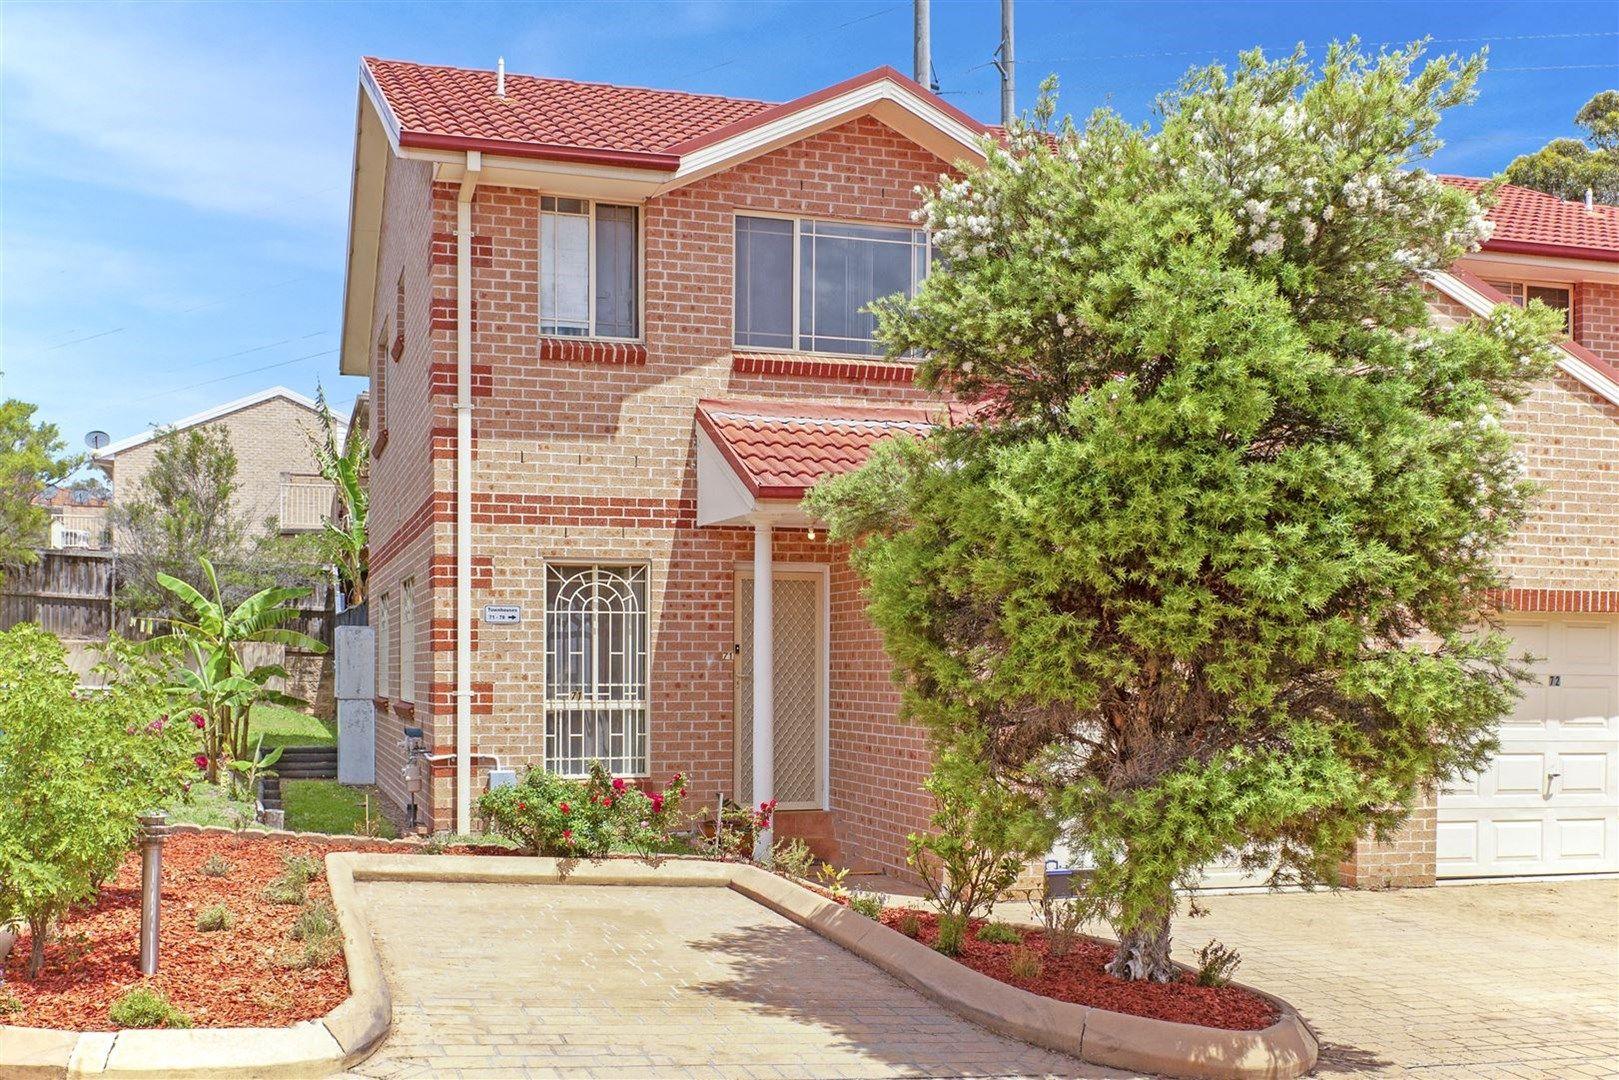 71/17-19 Huntley Drive, Blacktown NSW 2148, Image 0